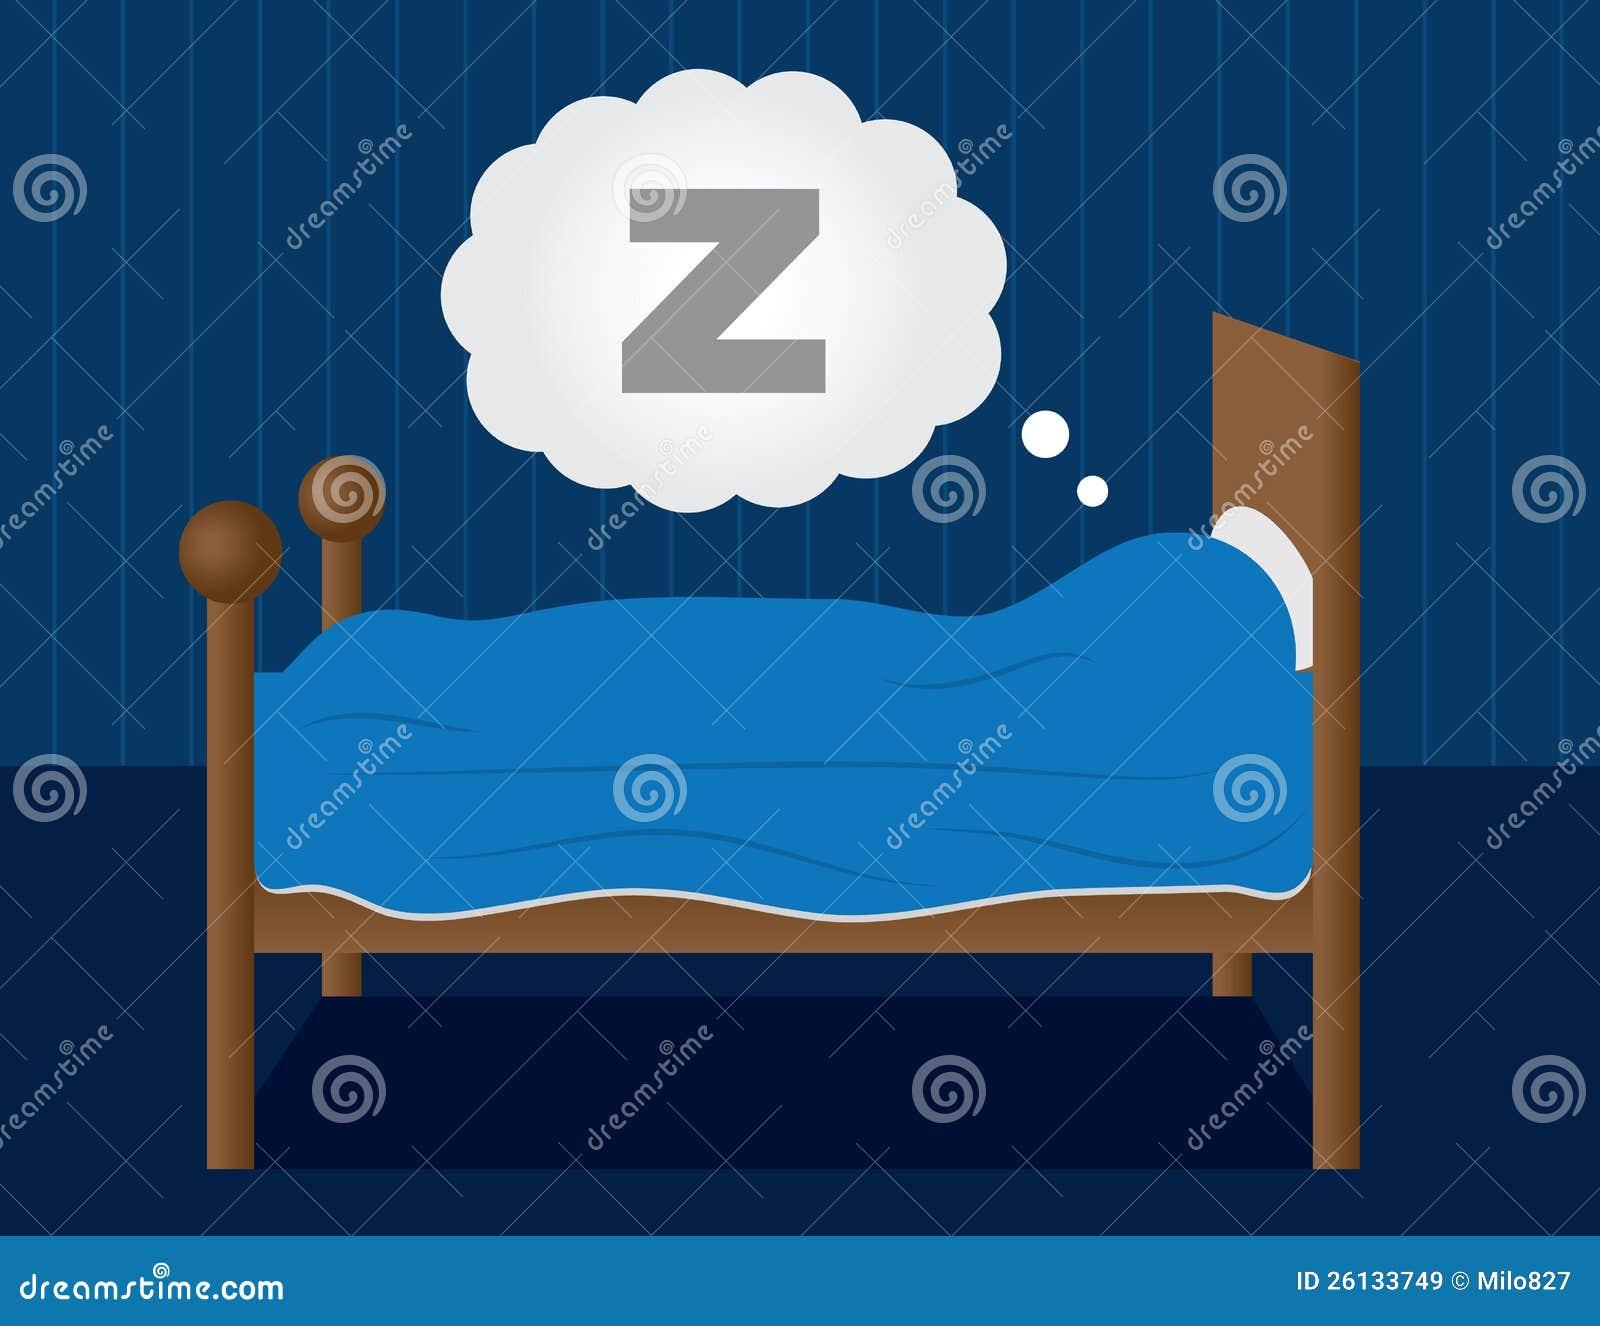 Schlafen im bett lizenzfreie stockbilder bild 26133749 for Bett schlafen